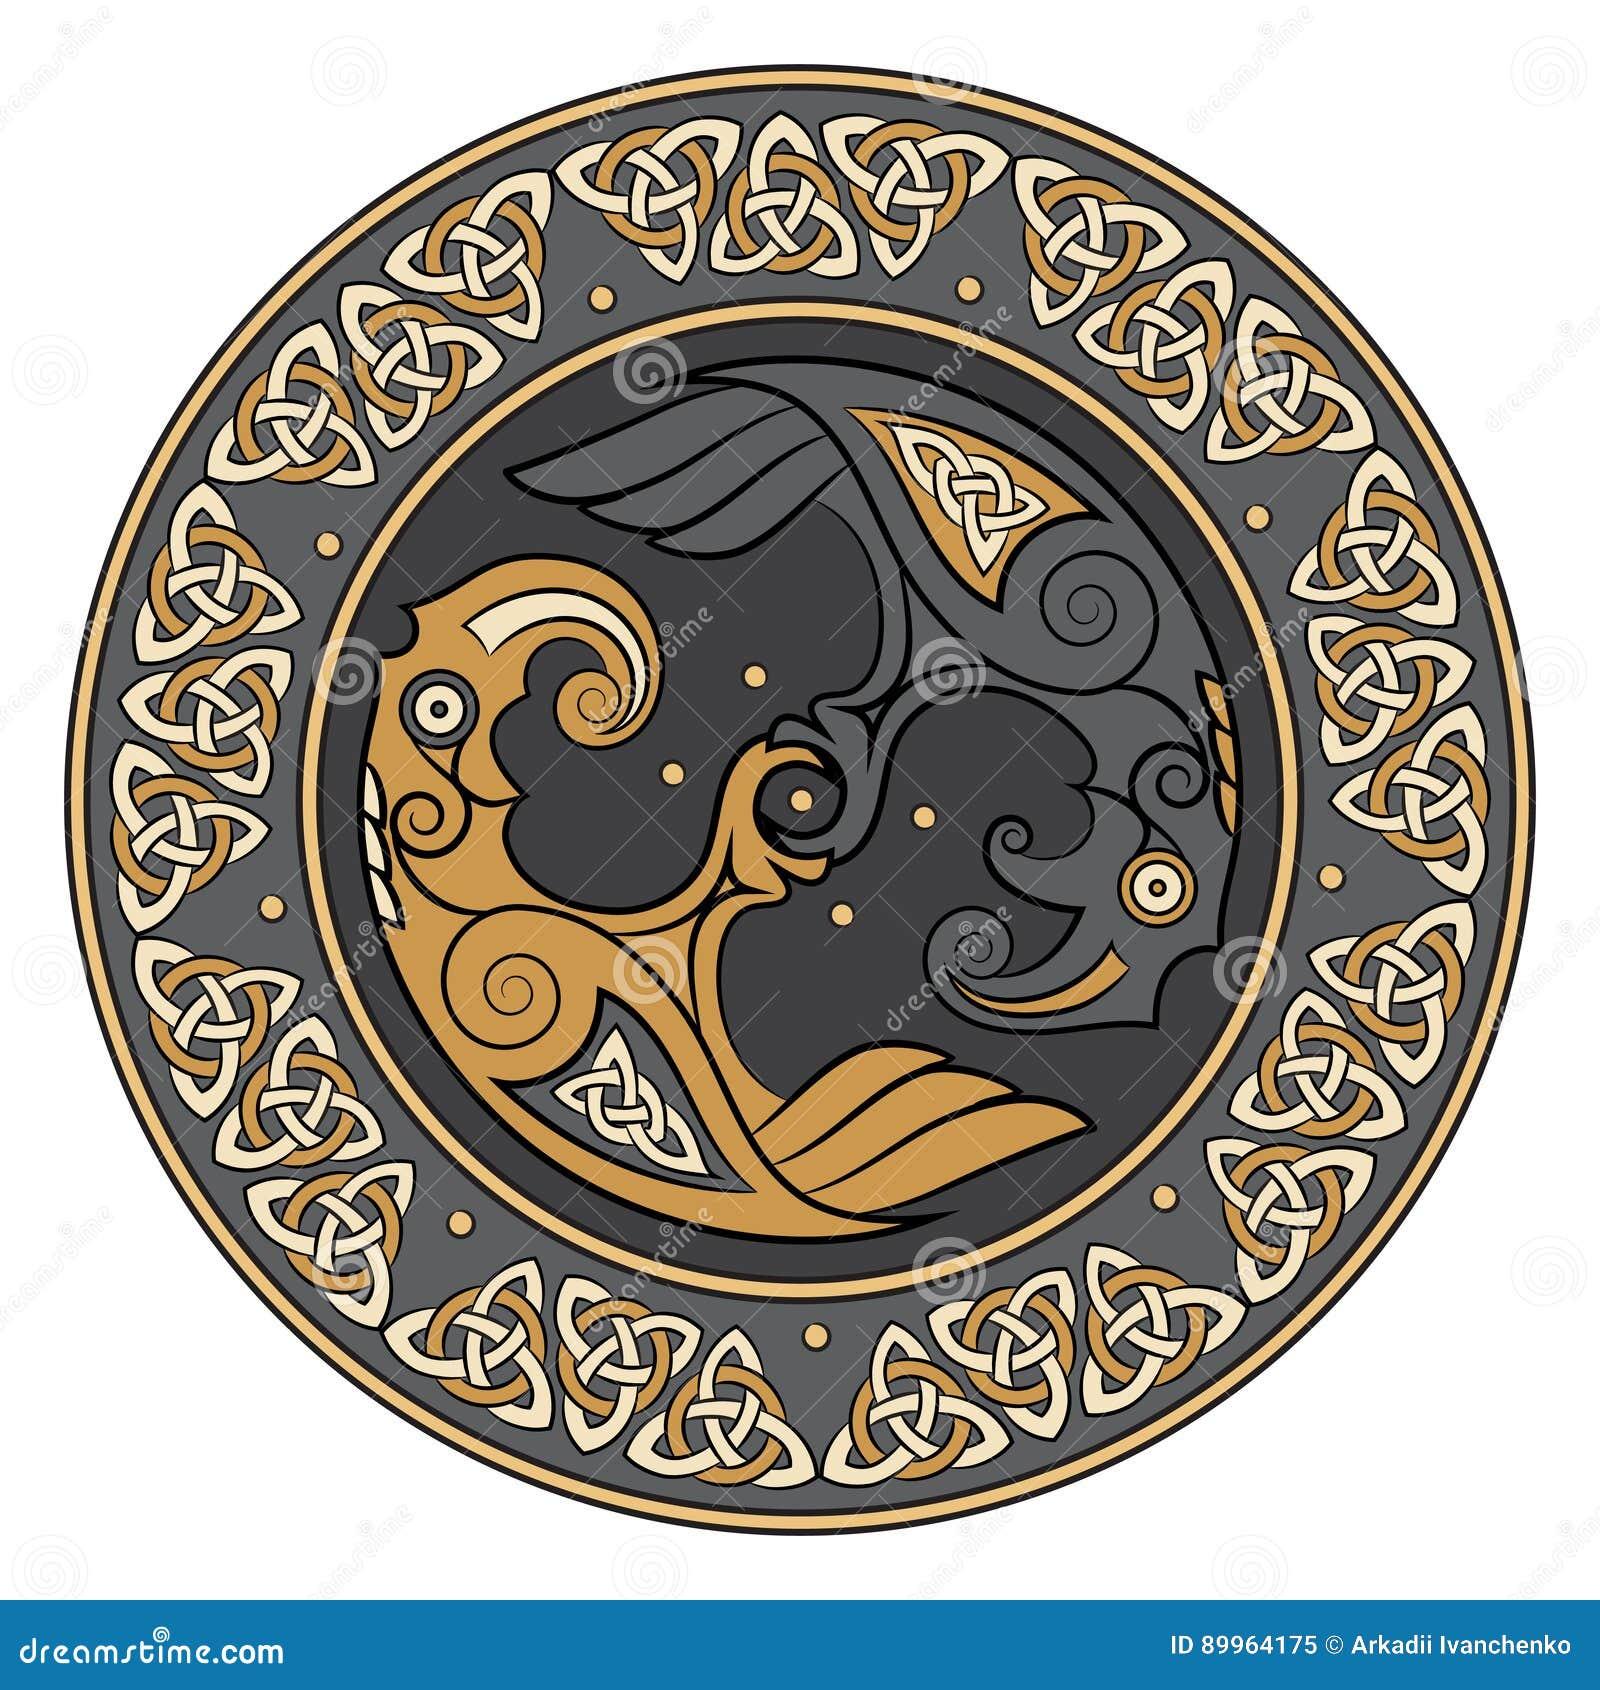 Viking Shield Decorated With A Scandinavian Pattern And Ravens Of God Odin Huginn